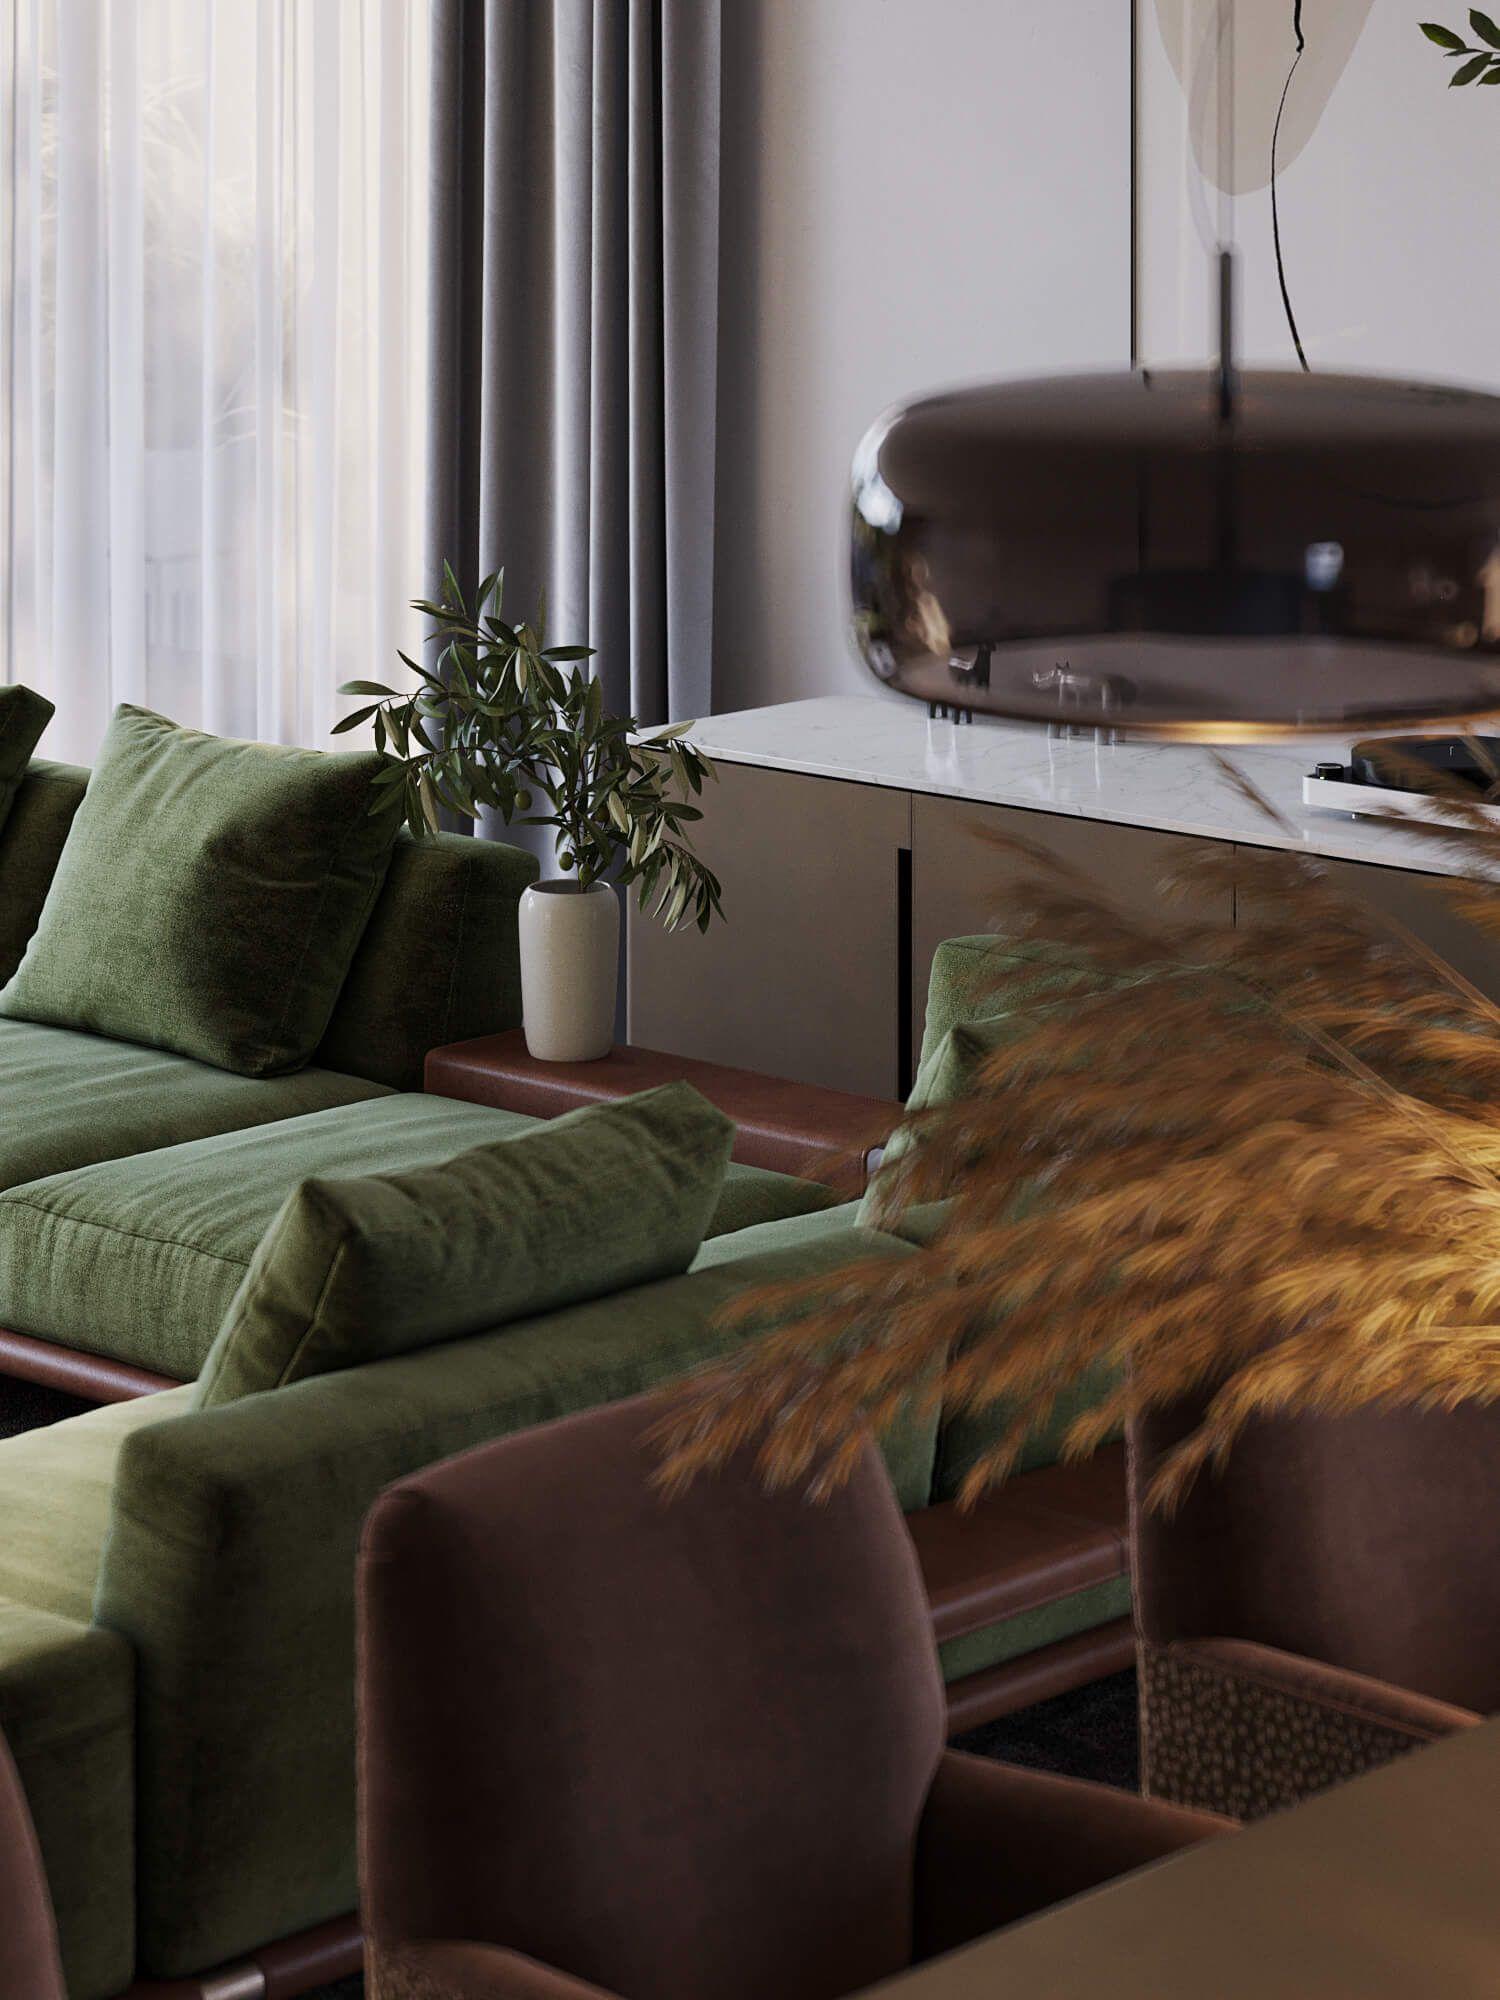 Autodesk Room Design: Pin On Living Room